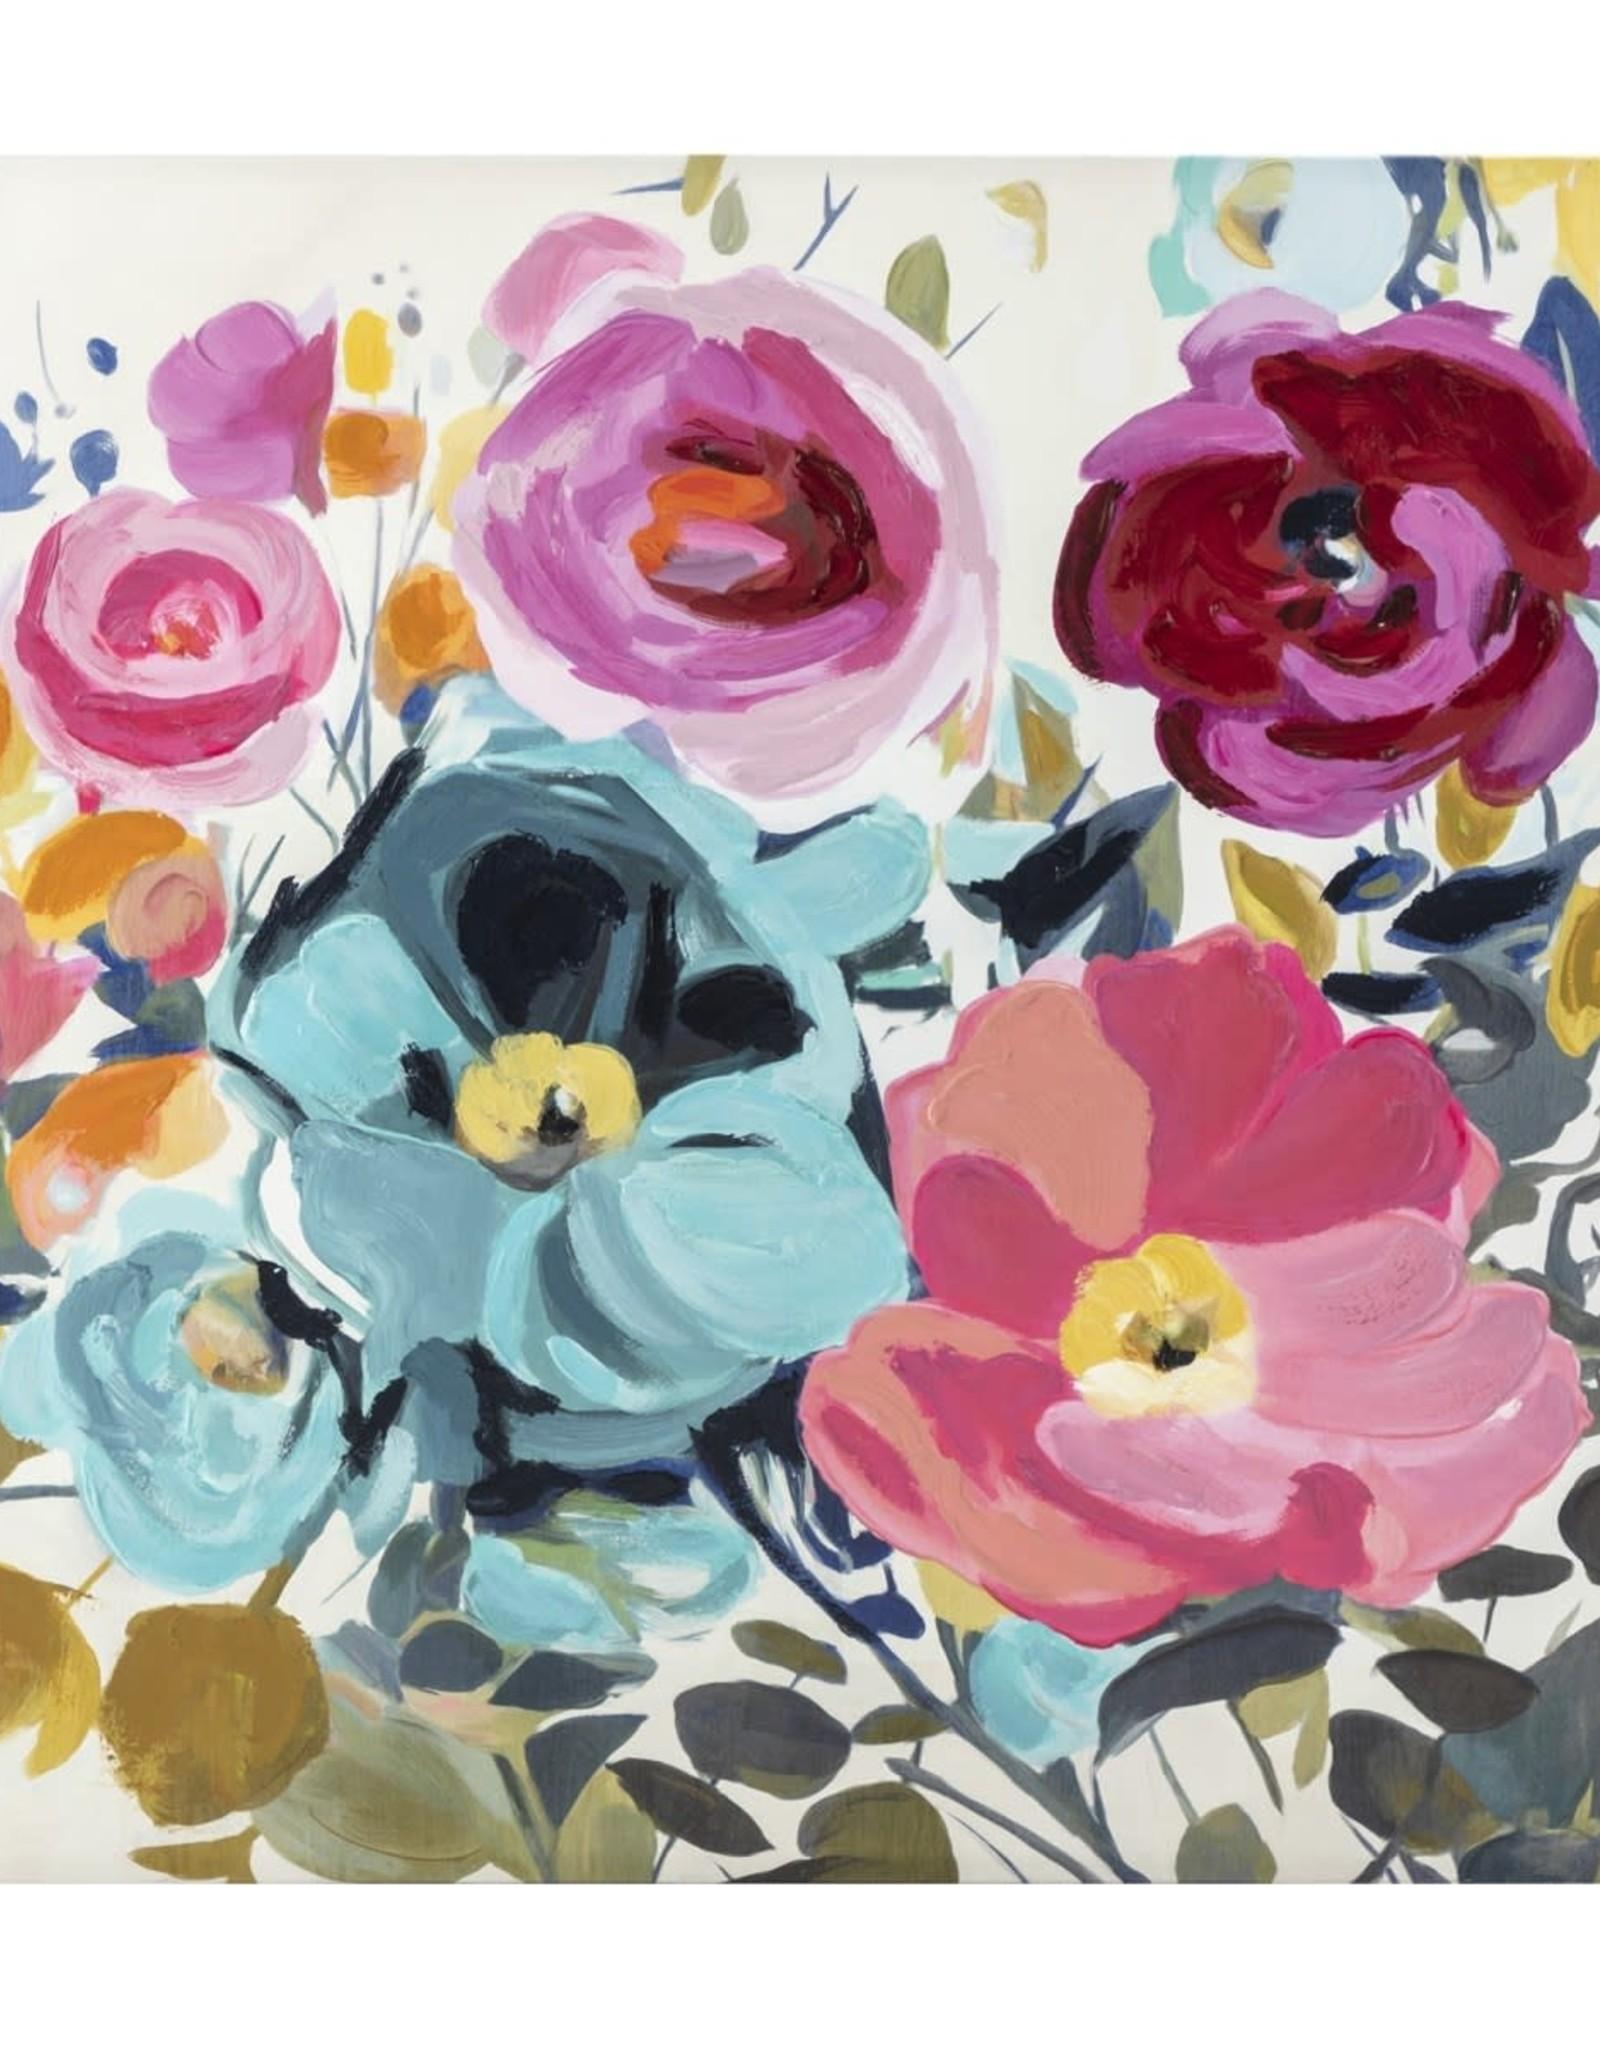 Phoebe Oil on Canvas